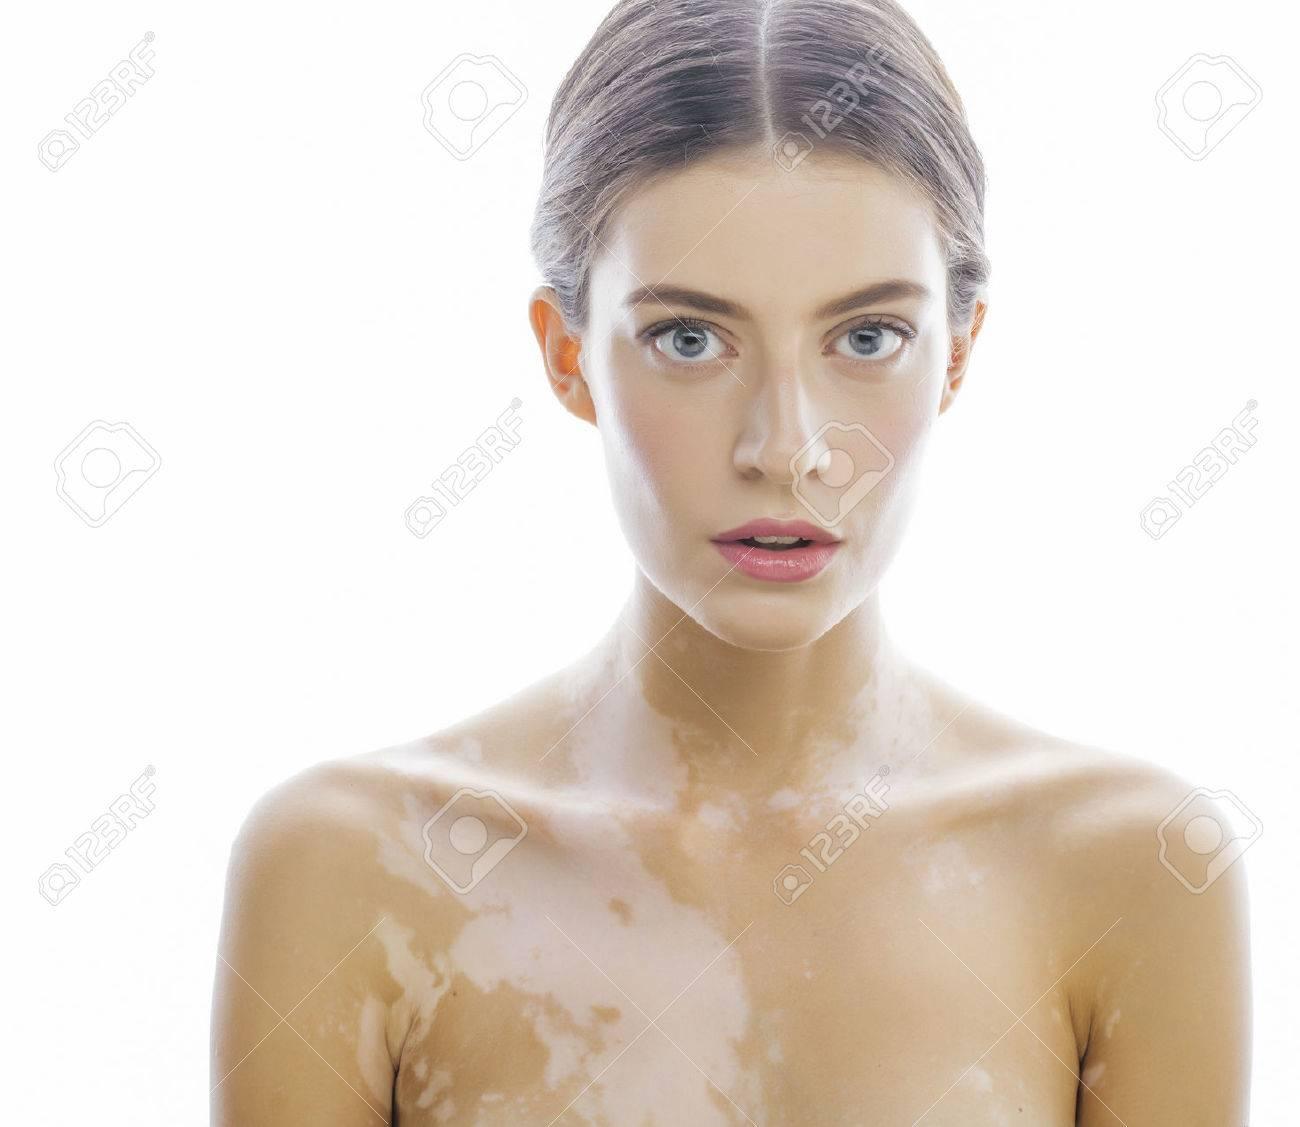 http://n3.datasn.io/data/api/v1/n3zm/image_of_skin_disease_5/by_table/skin_disease_image_download_access/45/70/51/98/45705198d89136096cd1cca101d850c0cb81e6a1.jpg